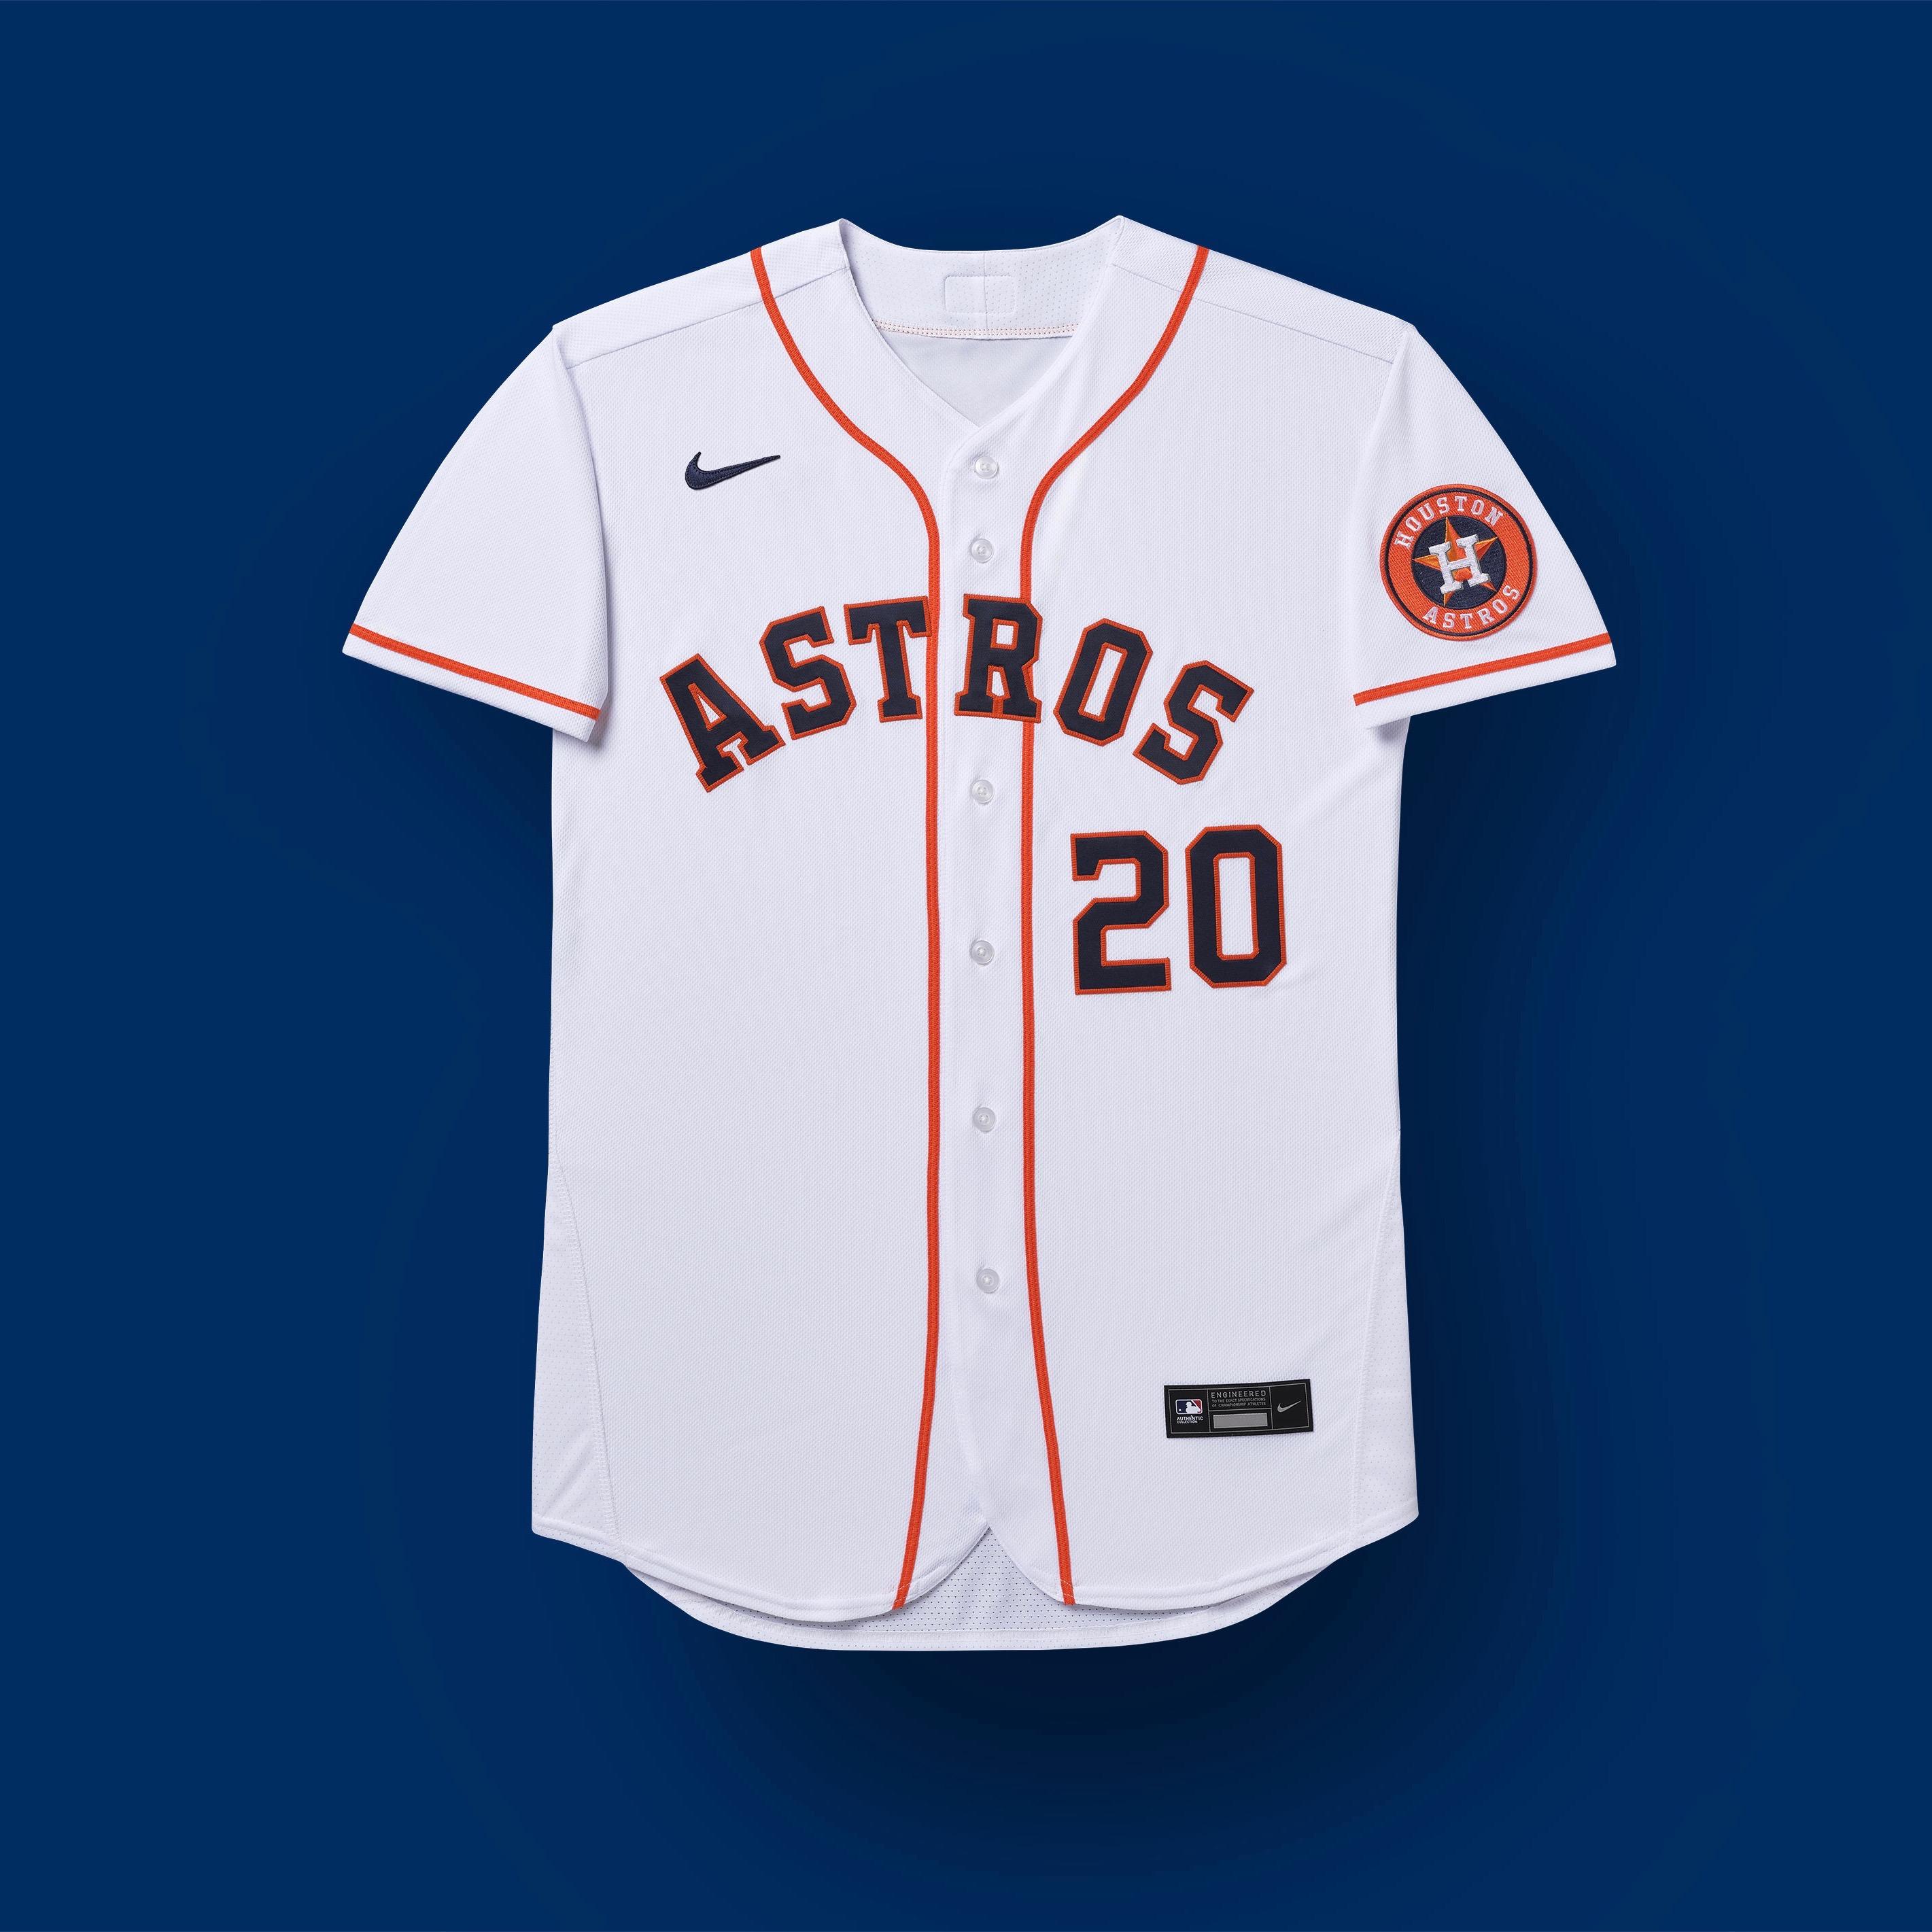 houston astros 2020 uniforms